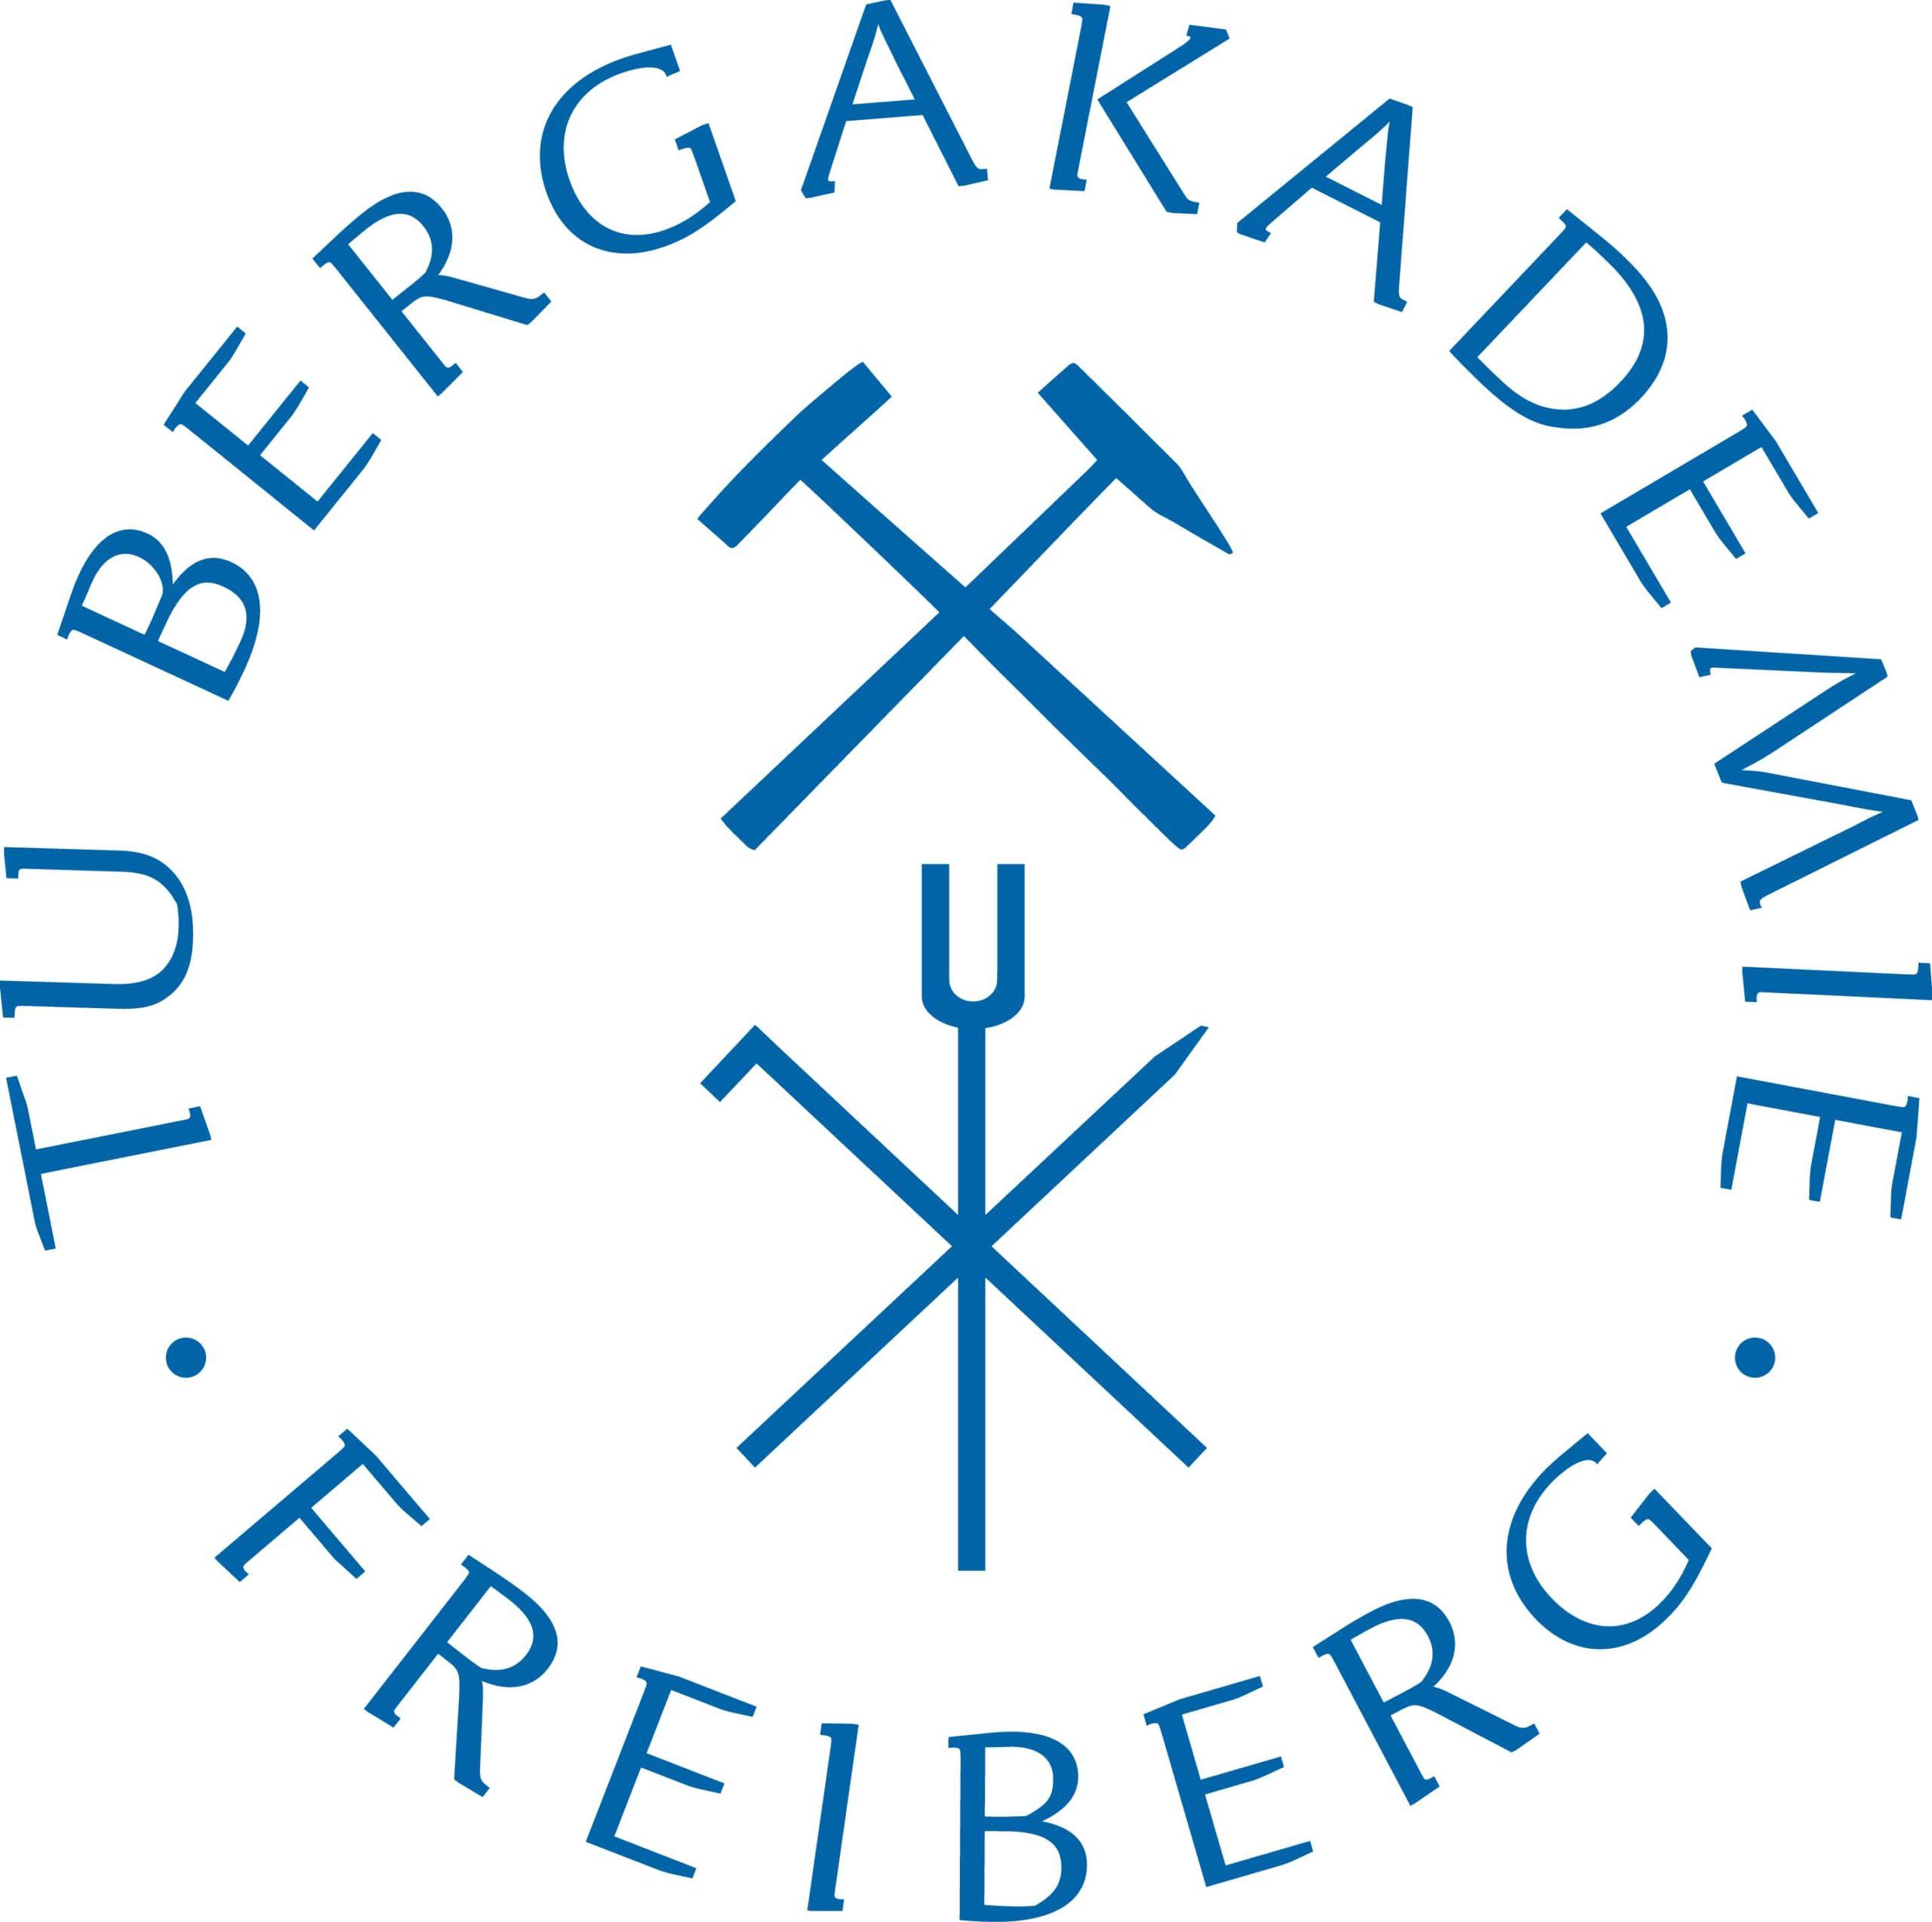 Das Logo der TU Bergakademie Freiberg